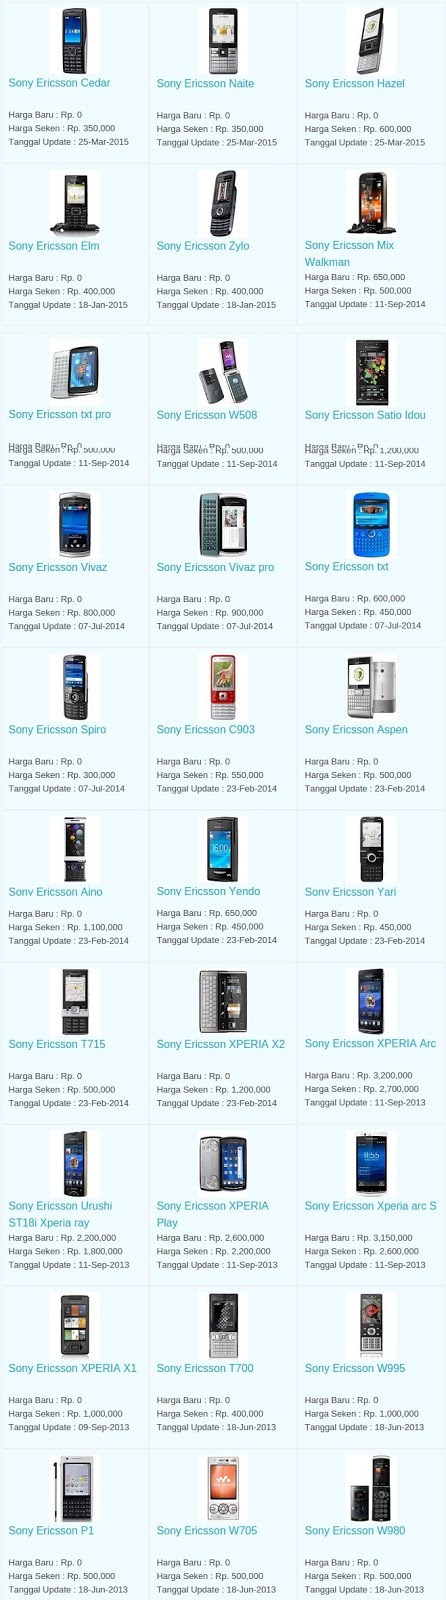 Daftar Harga Hp Terbaru Sony Ericsson Juli 2016